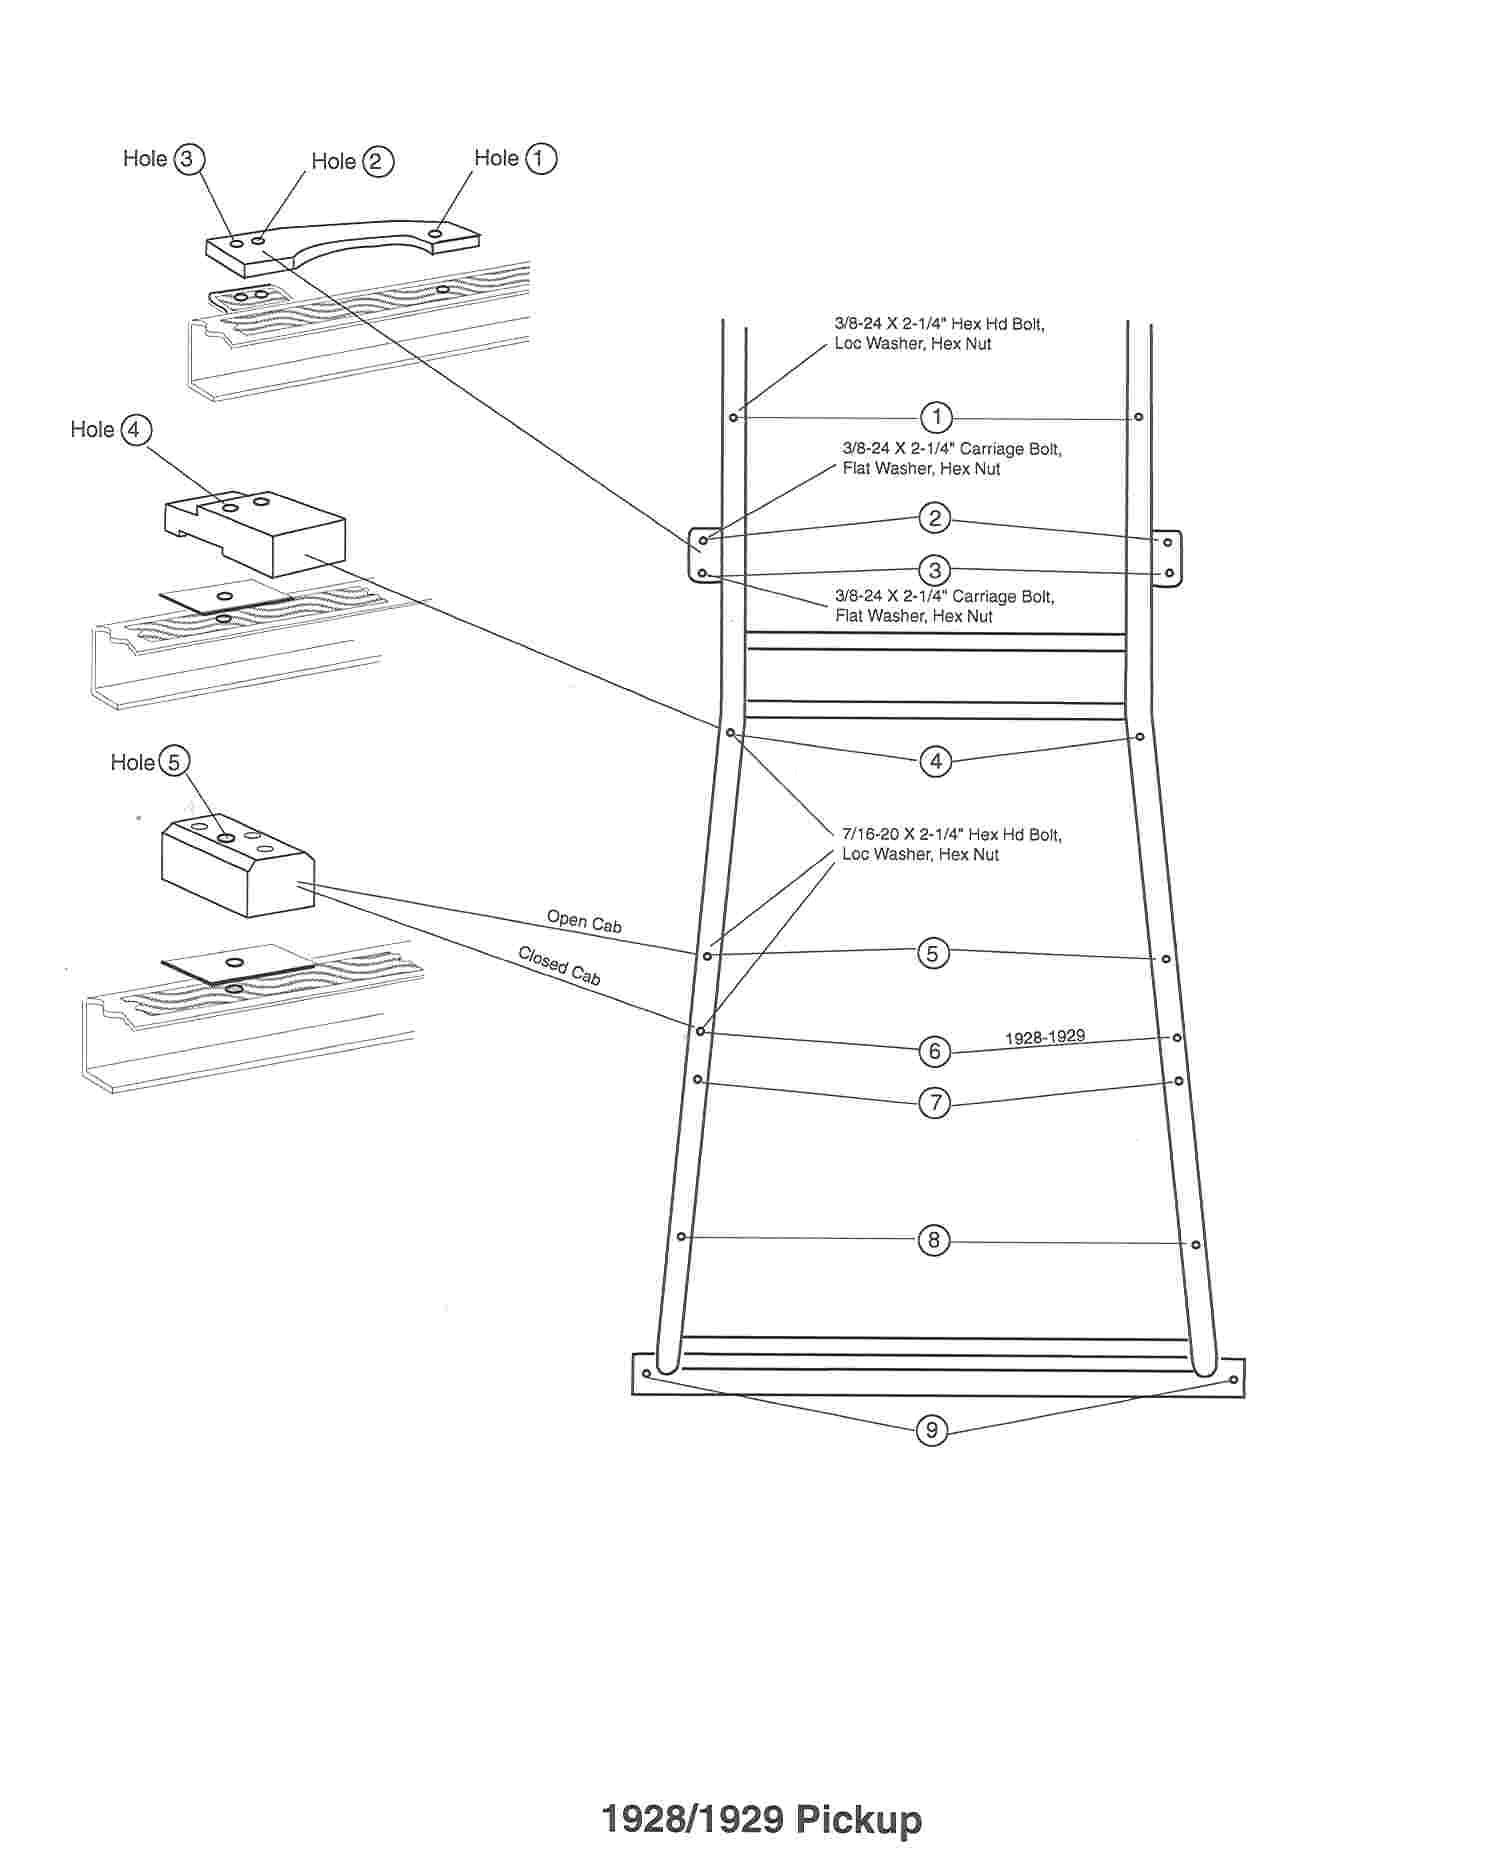 1928 ford tudor model a wiring diagram 1957 chevy wiring